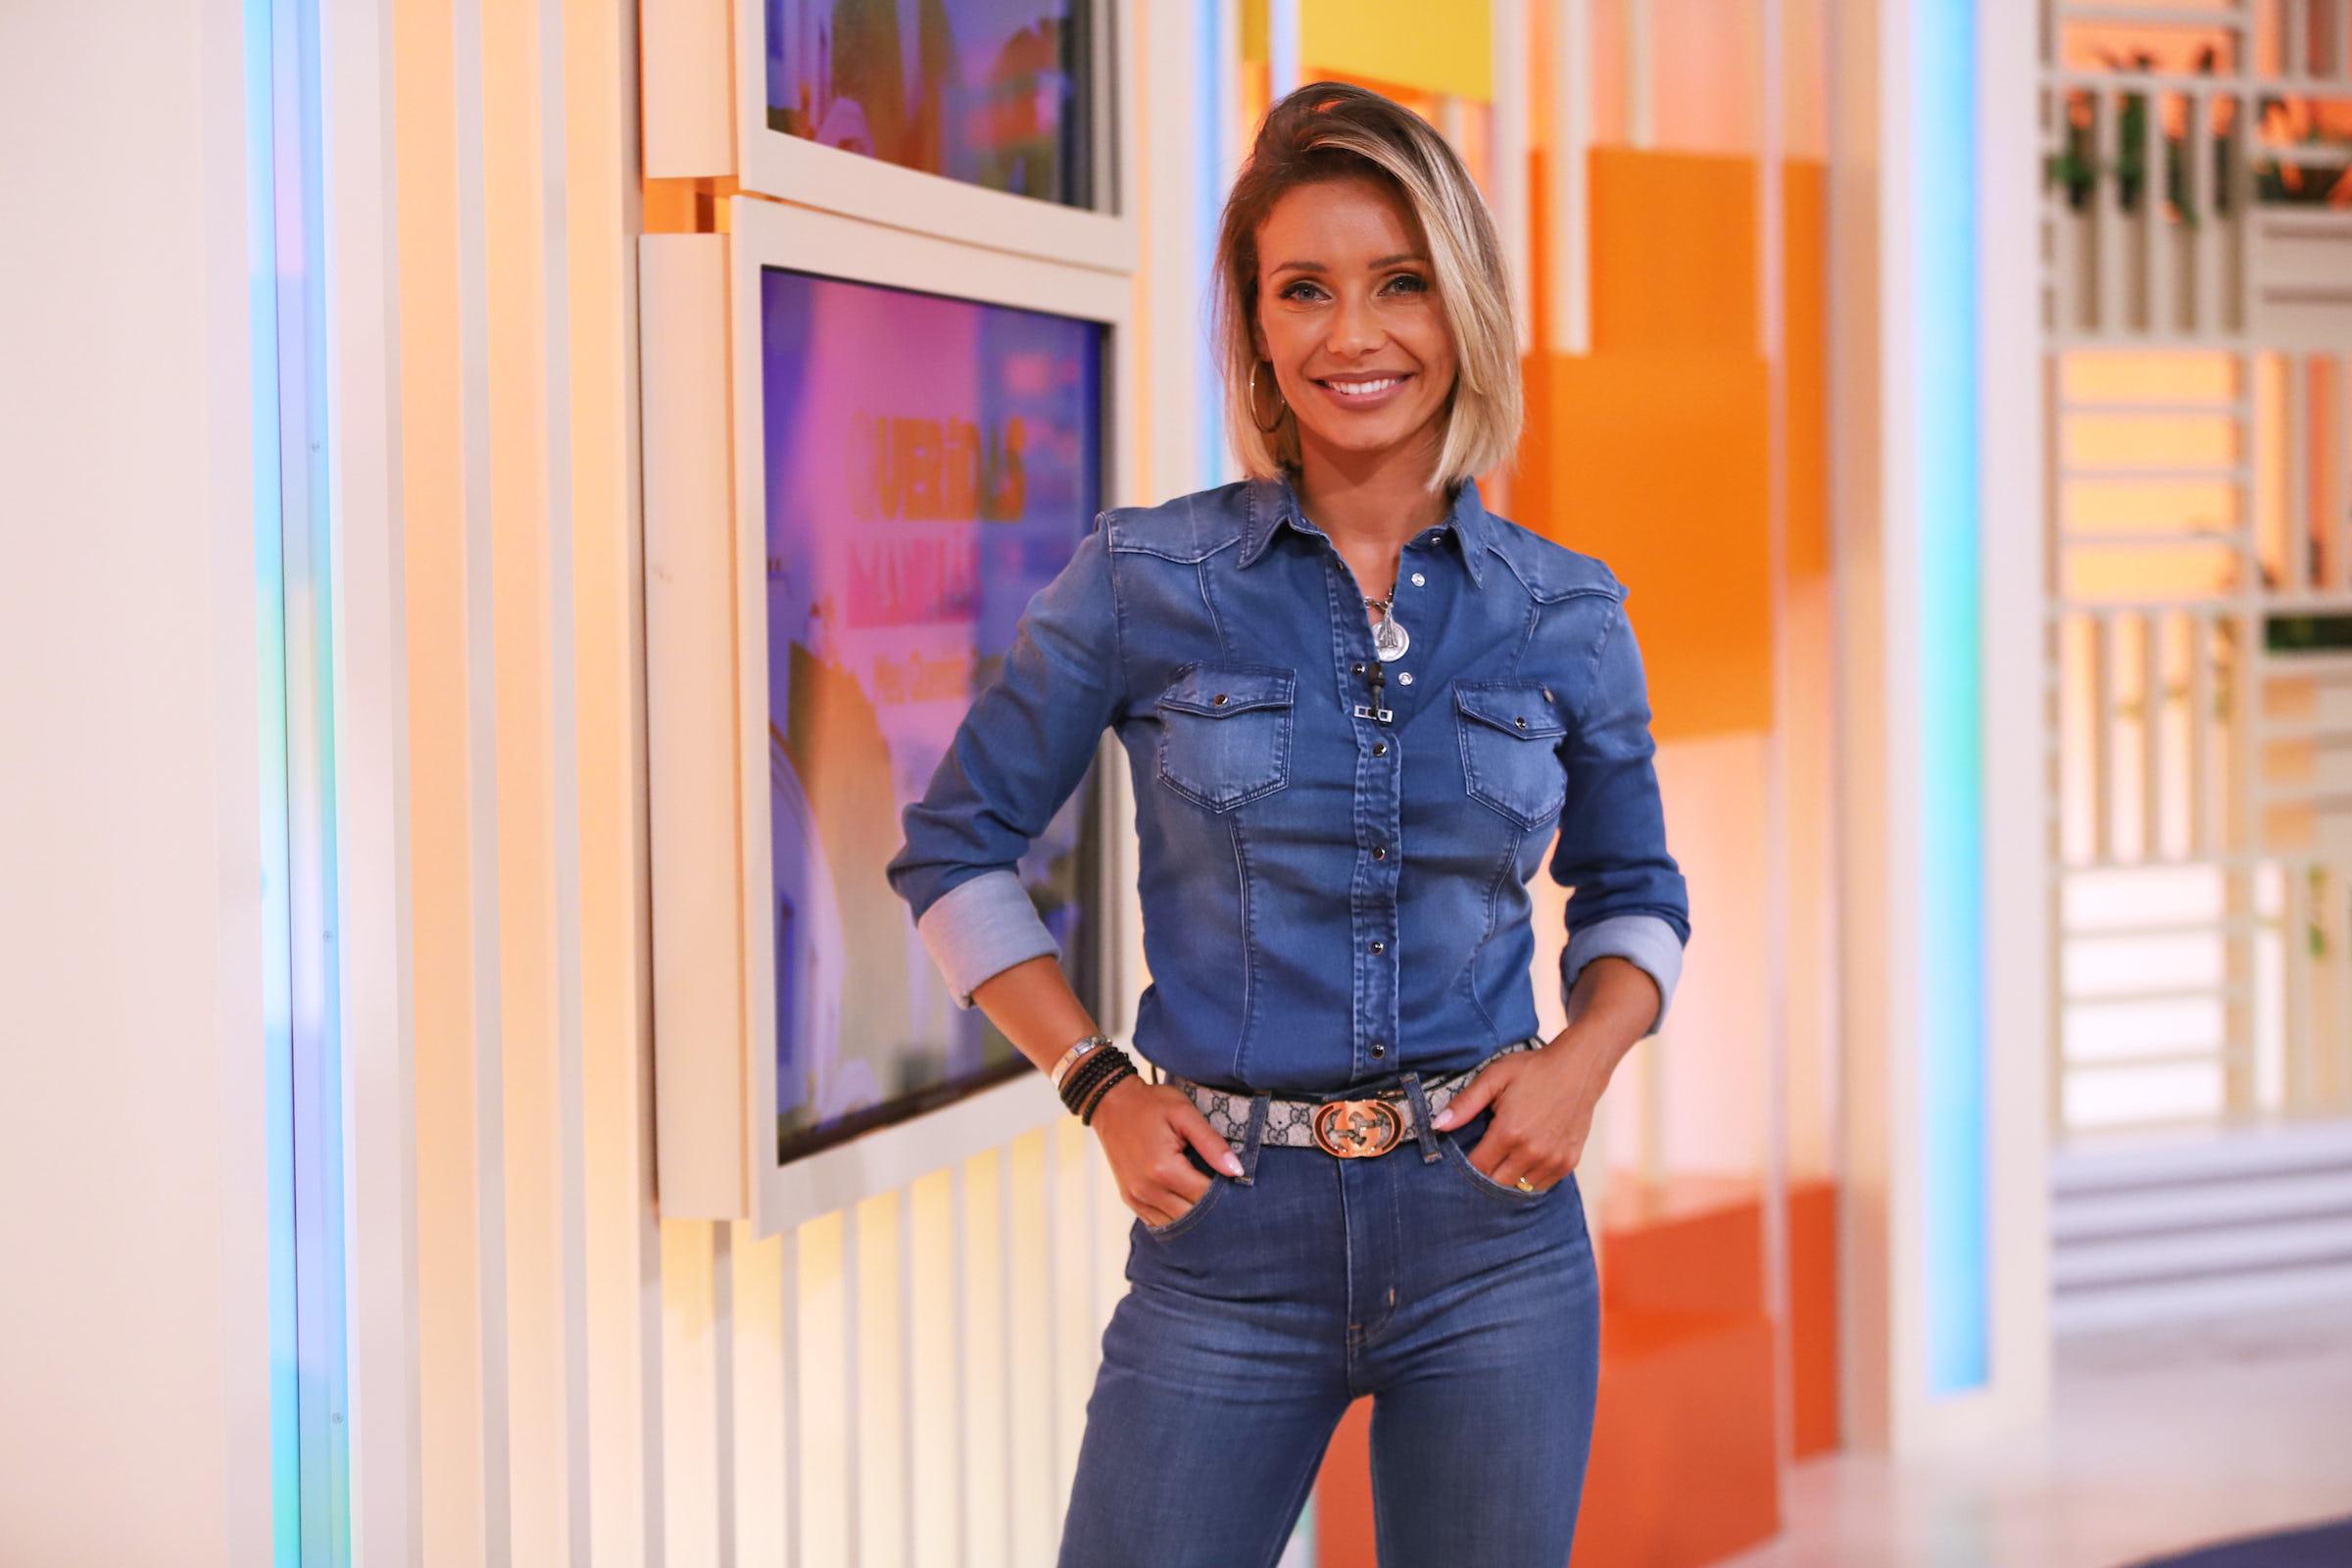 Luciana Abreu 3 Em Tribunal. Luciana Abreu Exige 111 Mil Euros A Yannick Djaló